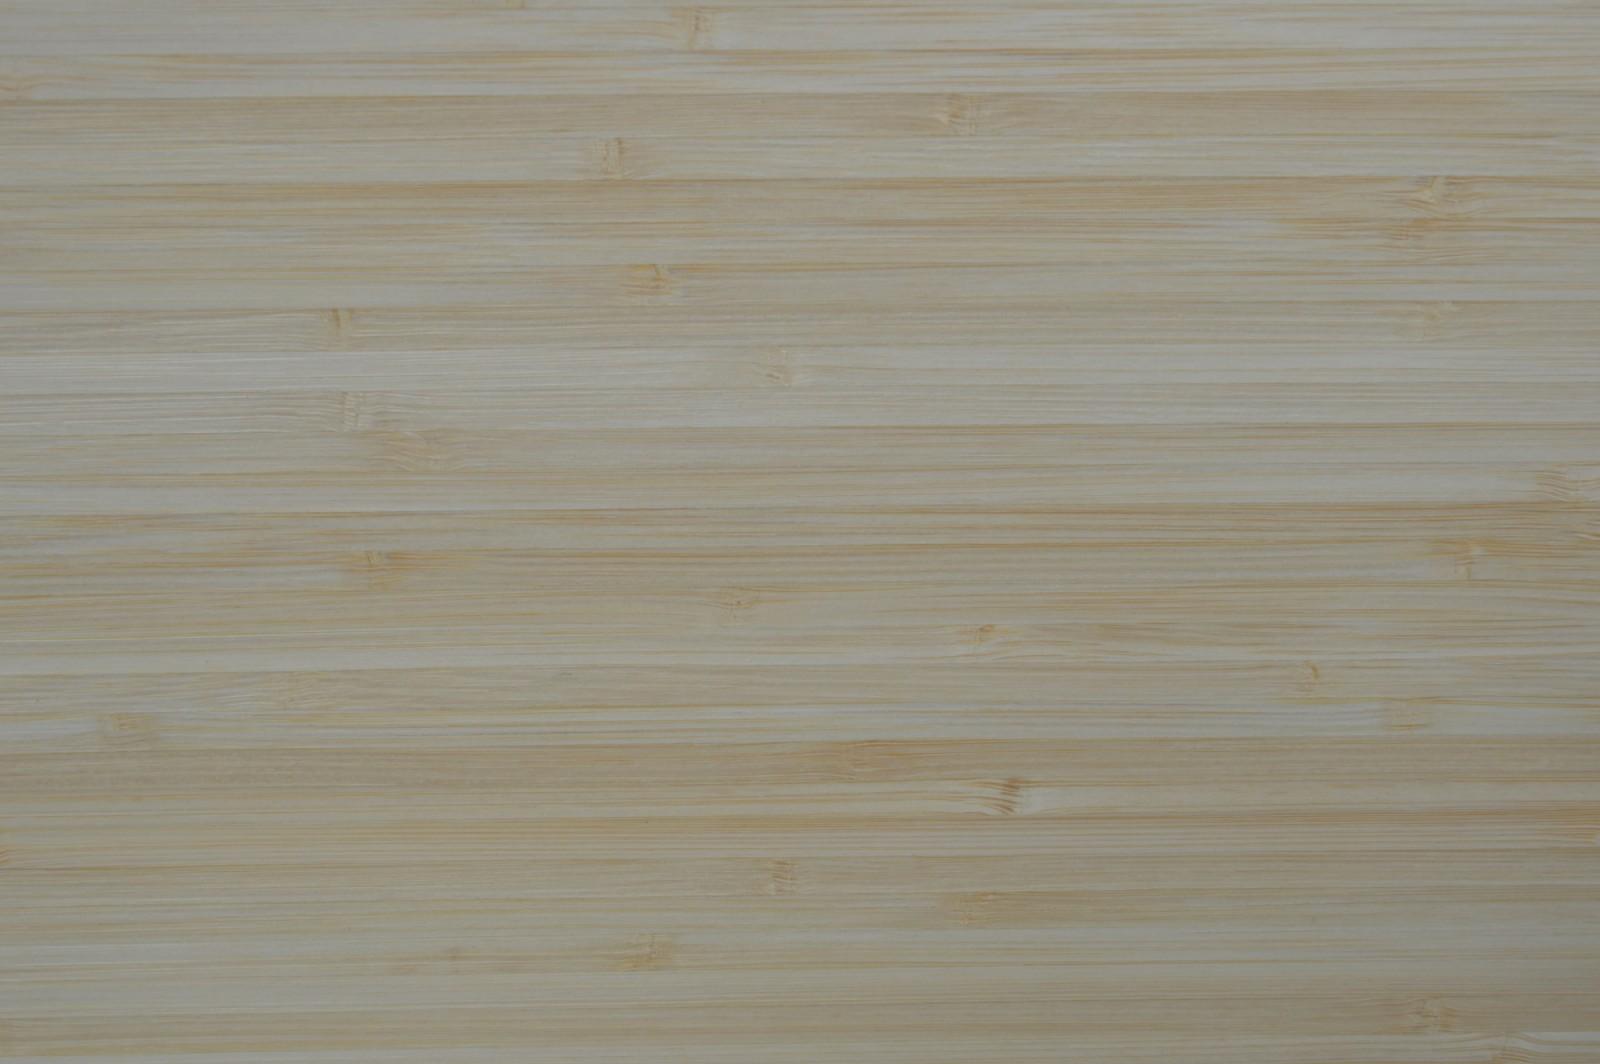 Bamboo Light Side Cut Silk - Real Wood Laminate - Palmer Timber